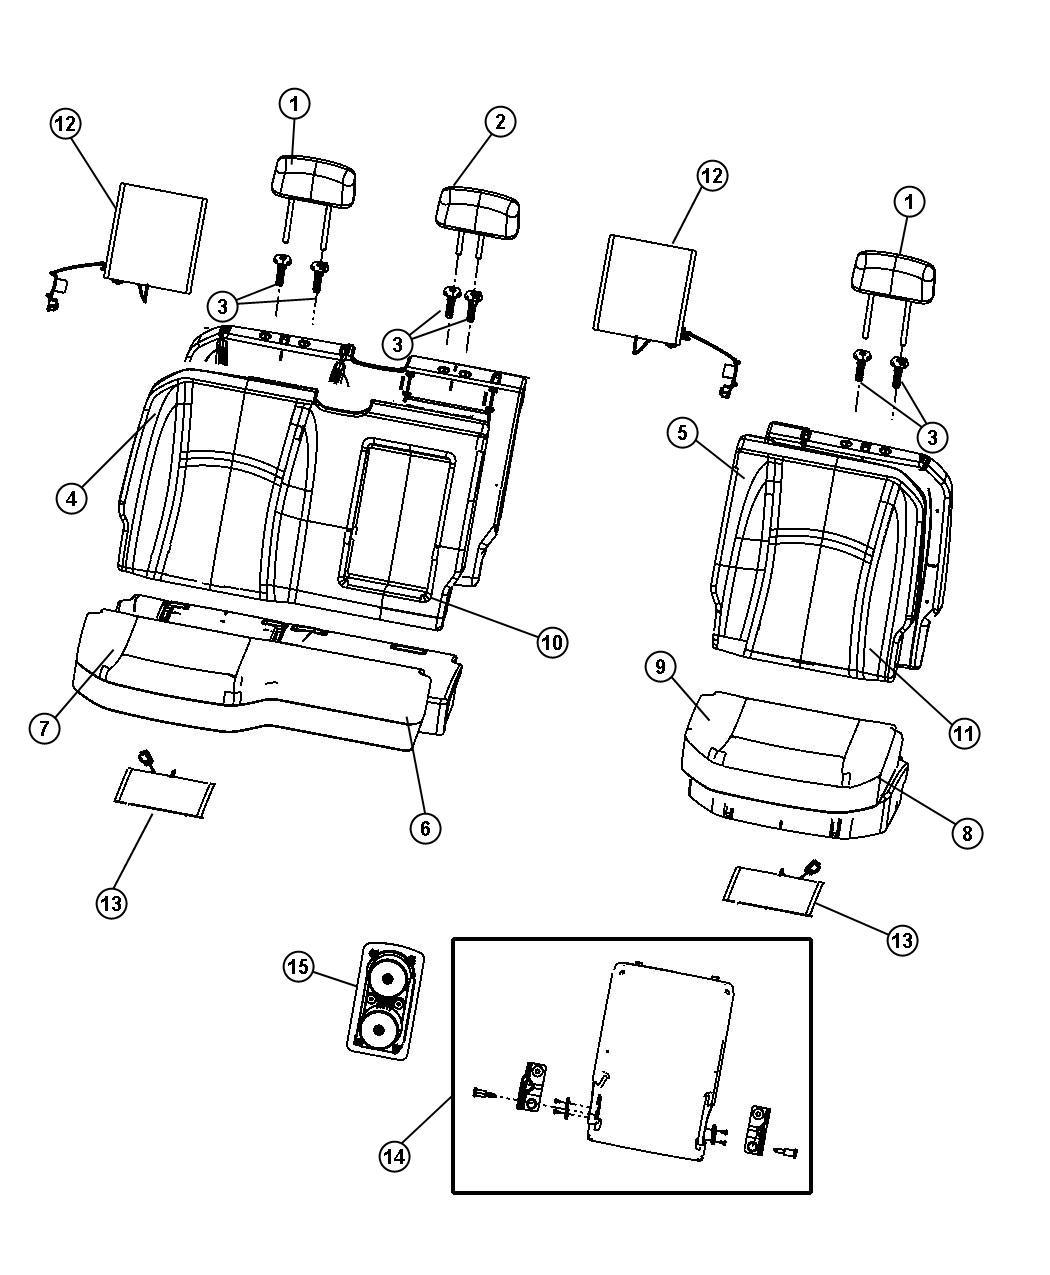 2012 dodge ram 1500 armrest  seat   de   trim    xj  color